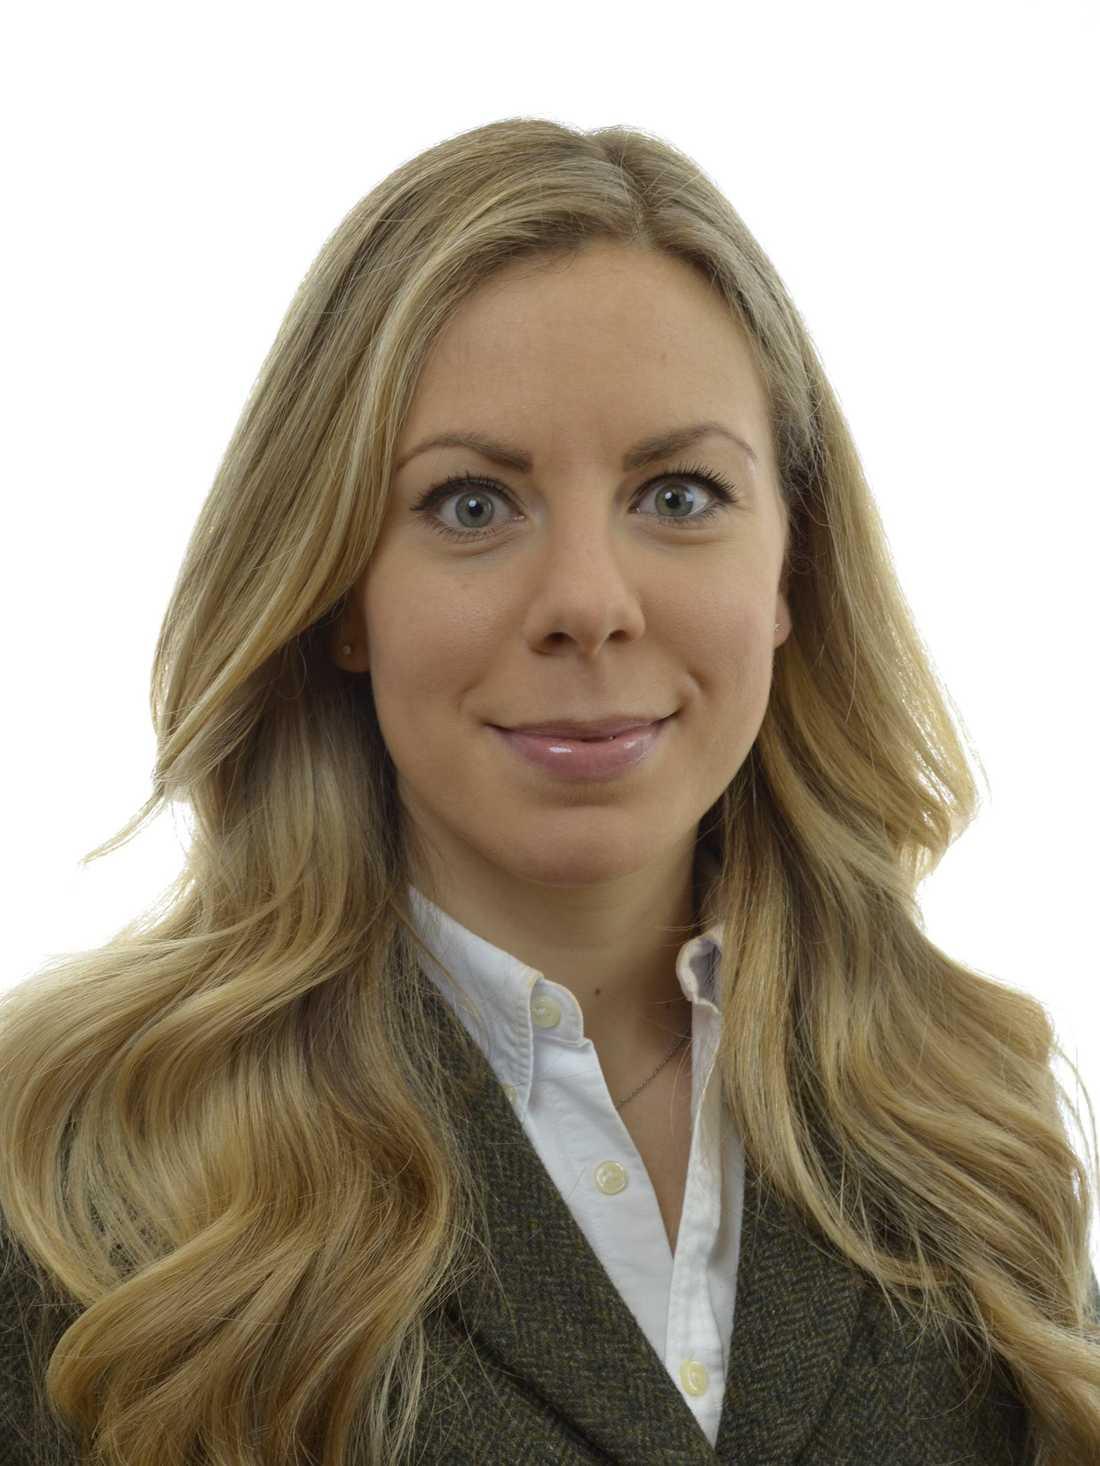 Jessica Rosencrantz, klimatpolitisk talesperson Moderaterna.